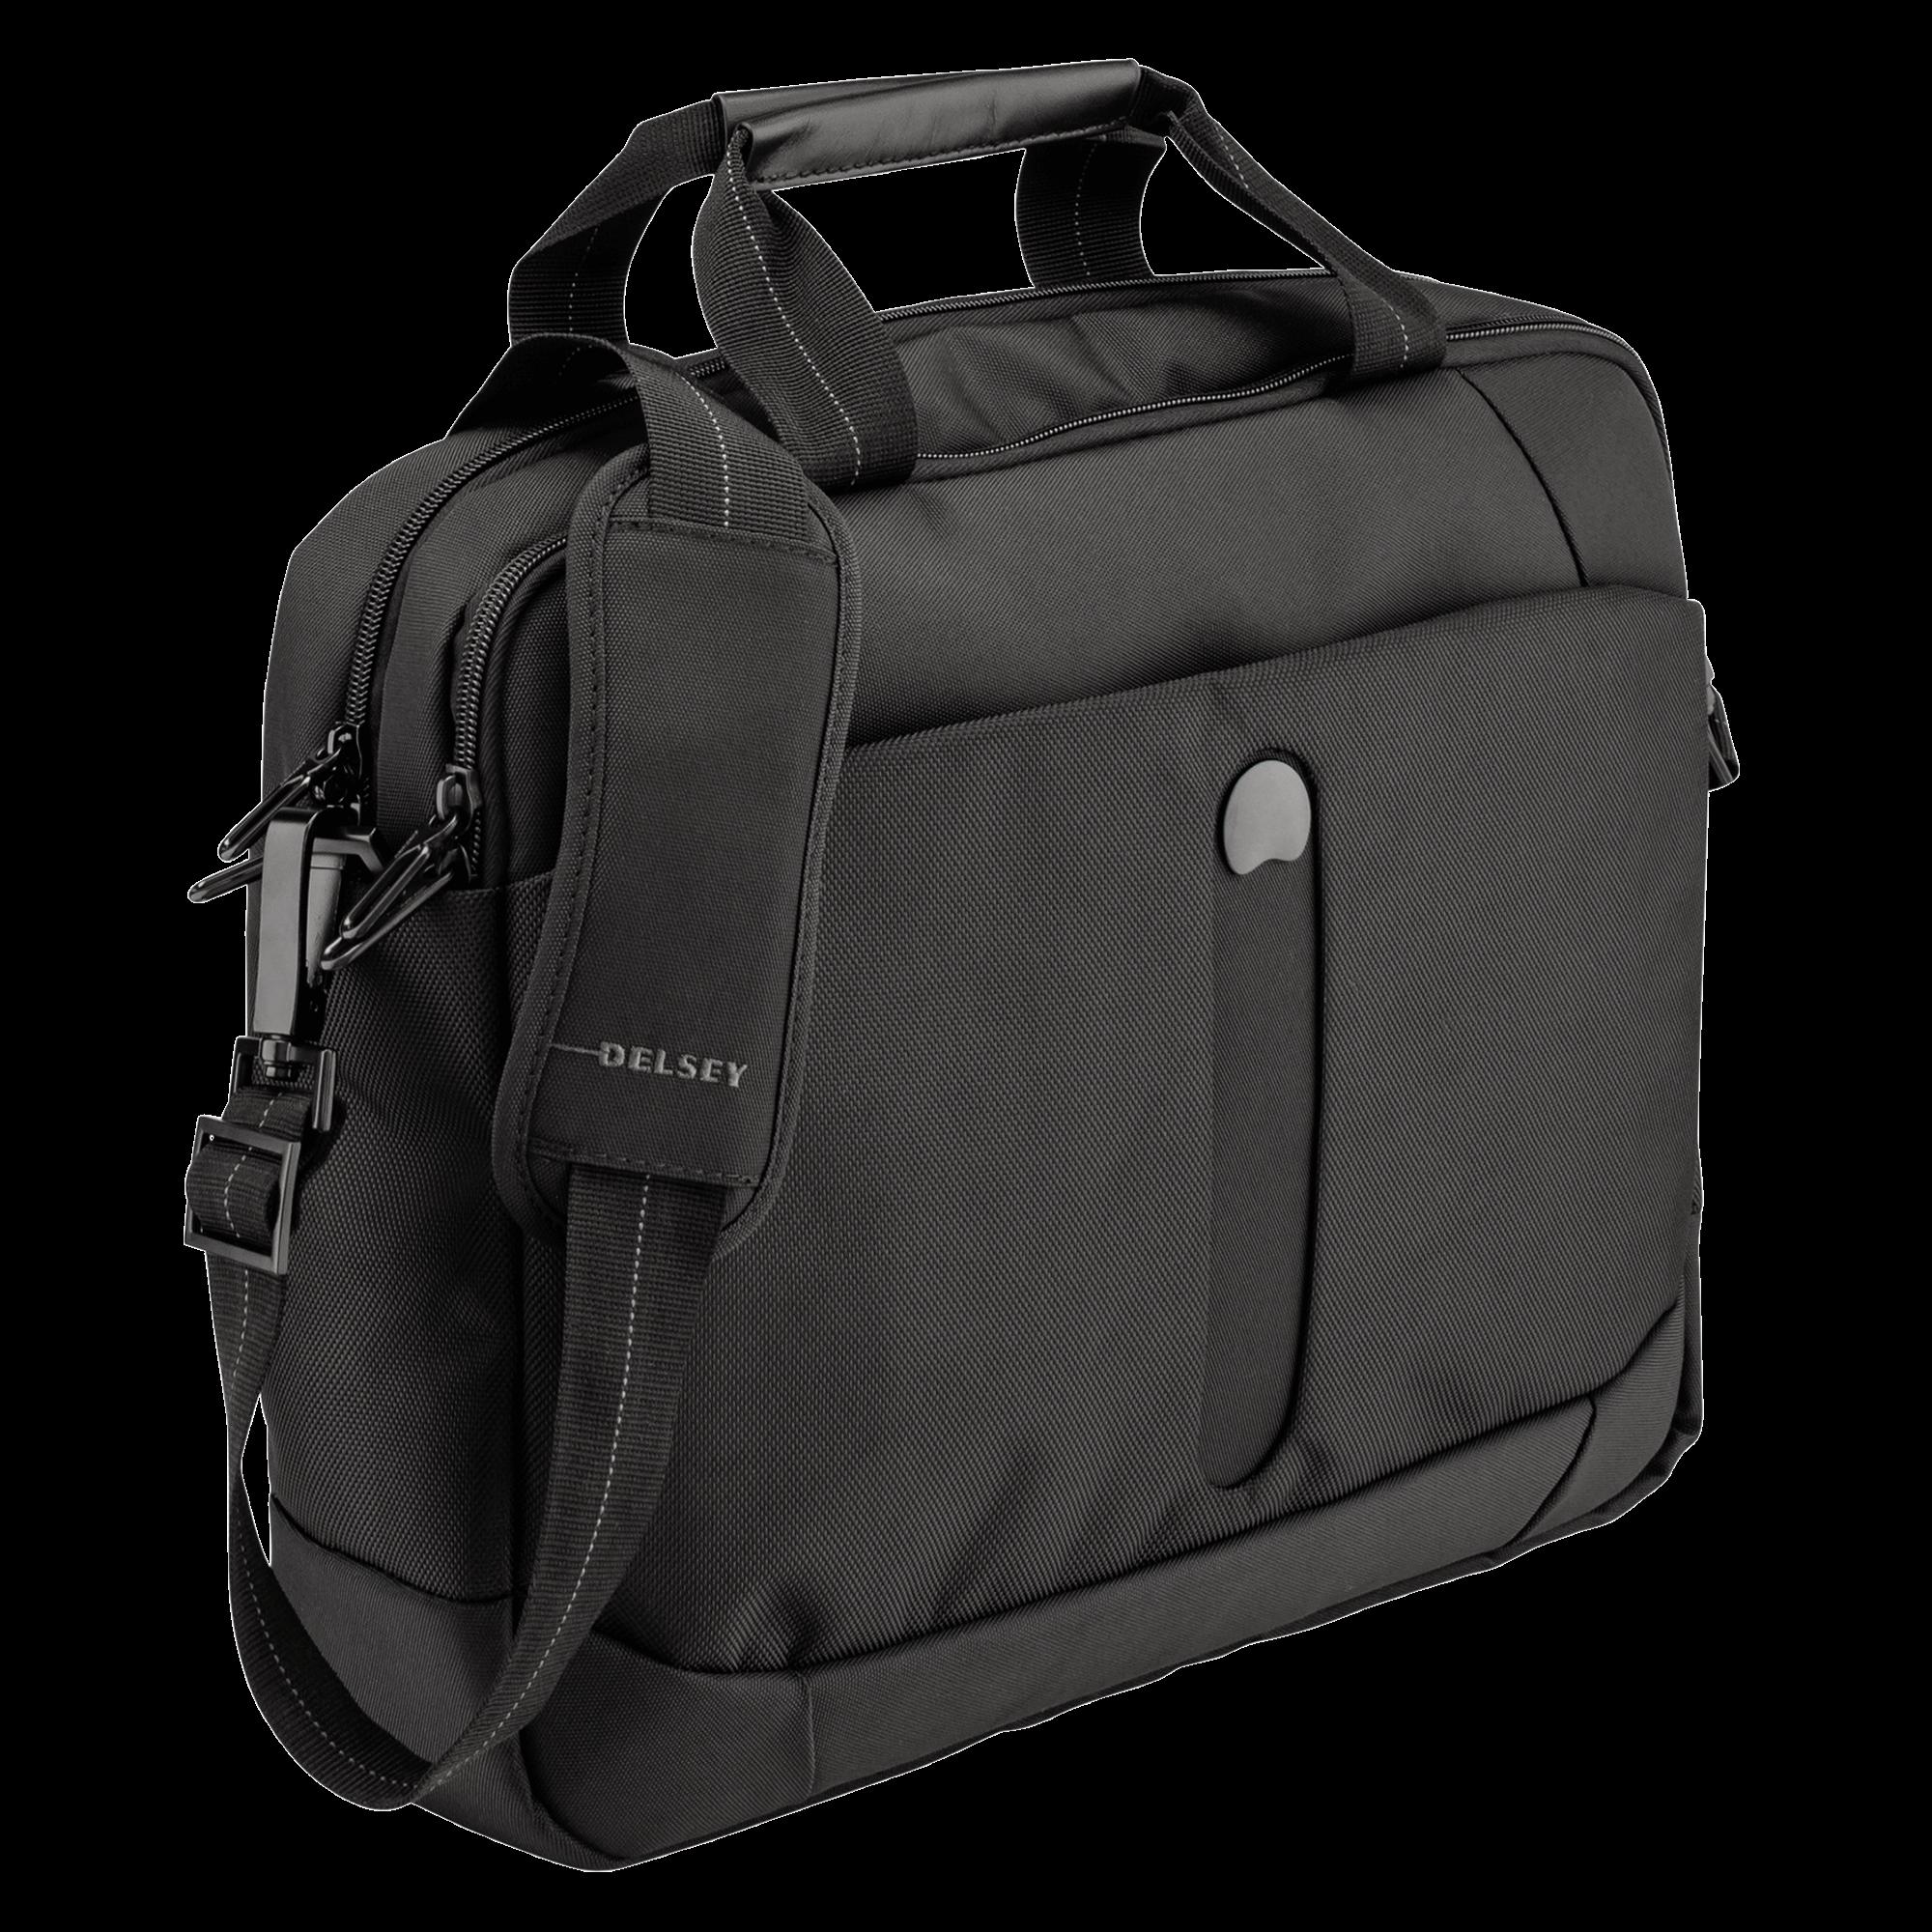 Delsey Bellcour 14 Laptop Bag 2 Compartments